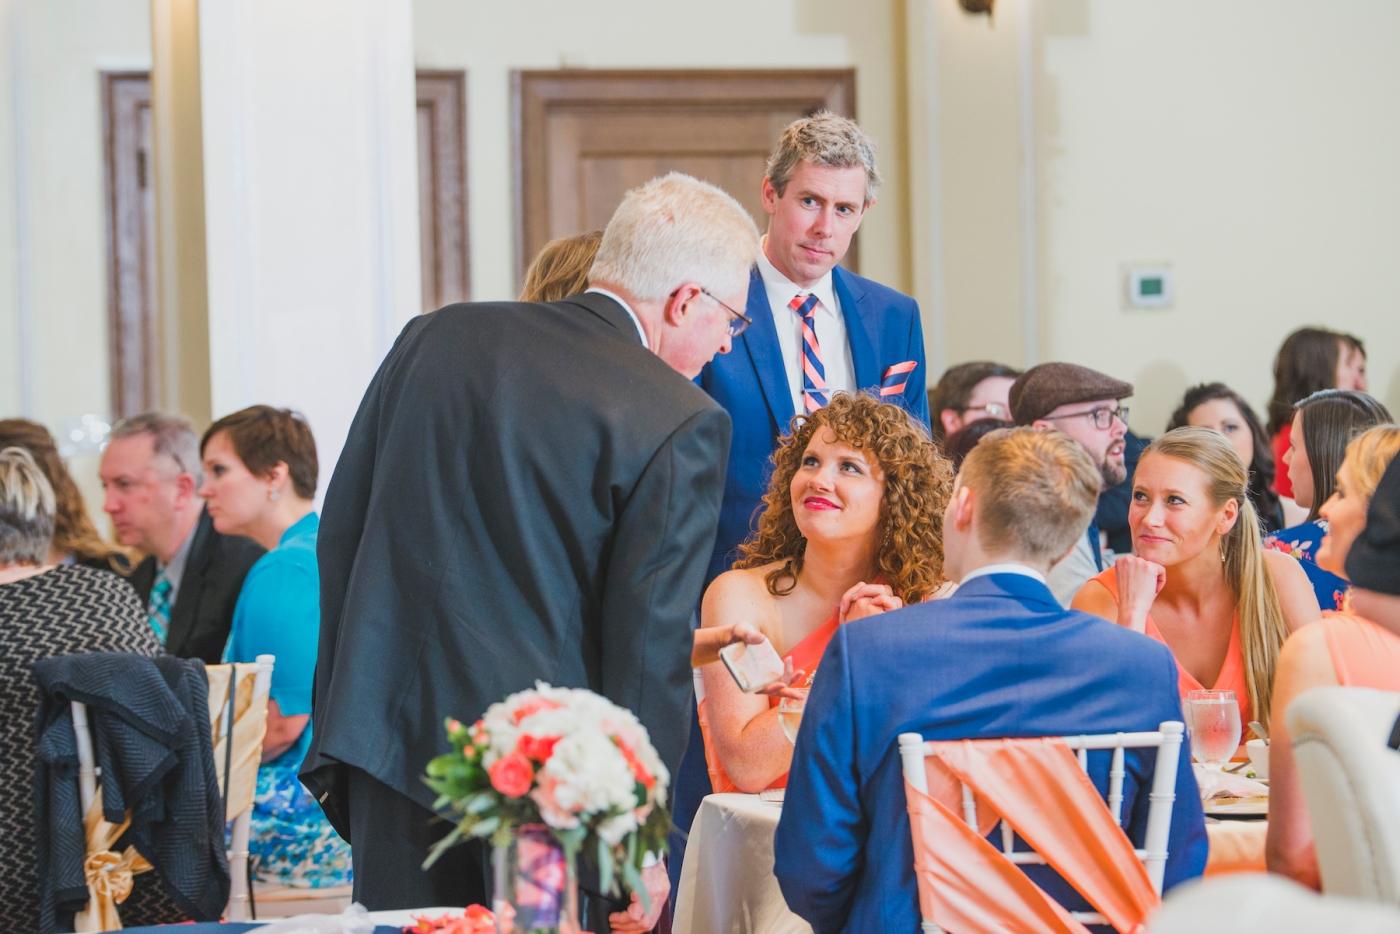 DSC_3205Everett_Wedding_Ballroom_Jane_Speleers_photography_Rachel_and_Edmund_reception_2017